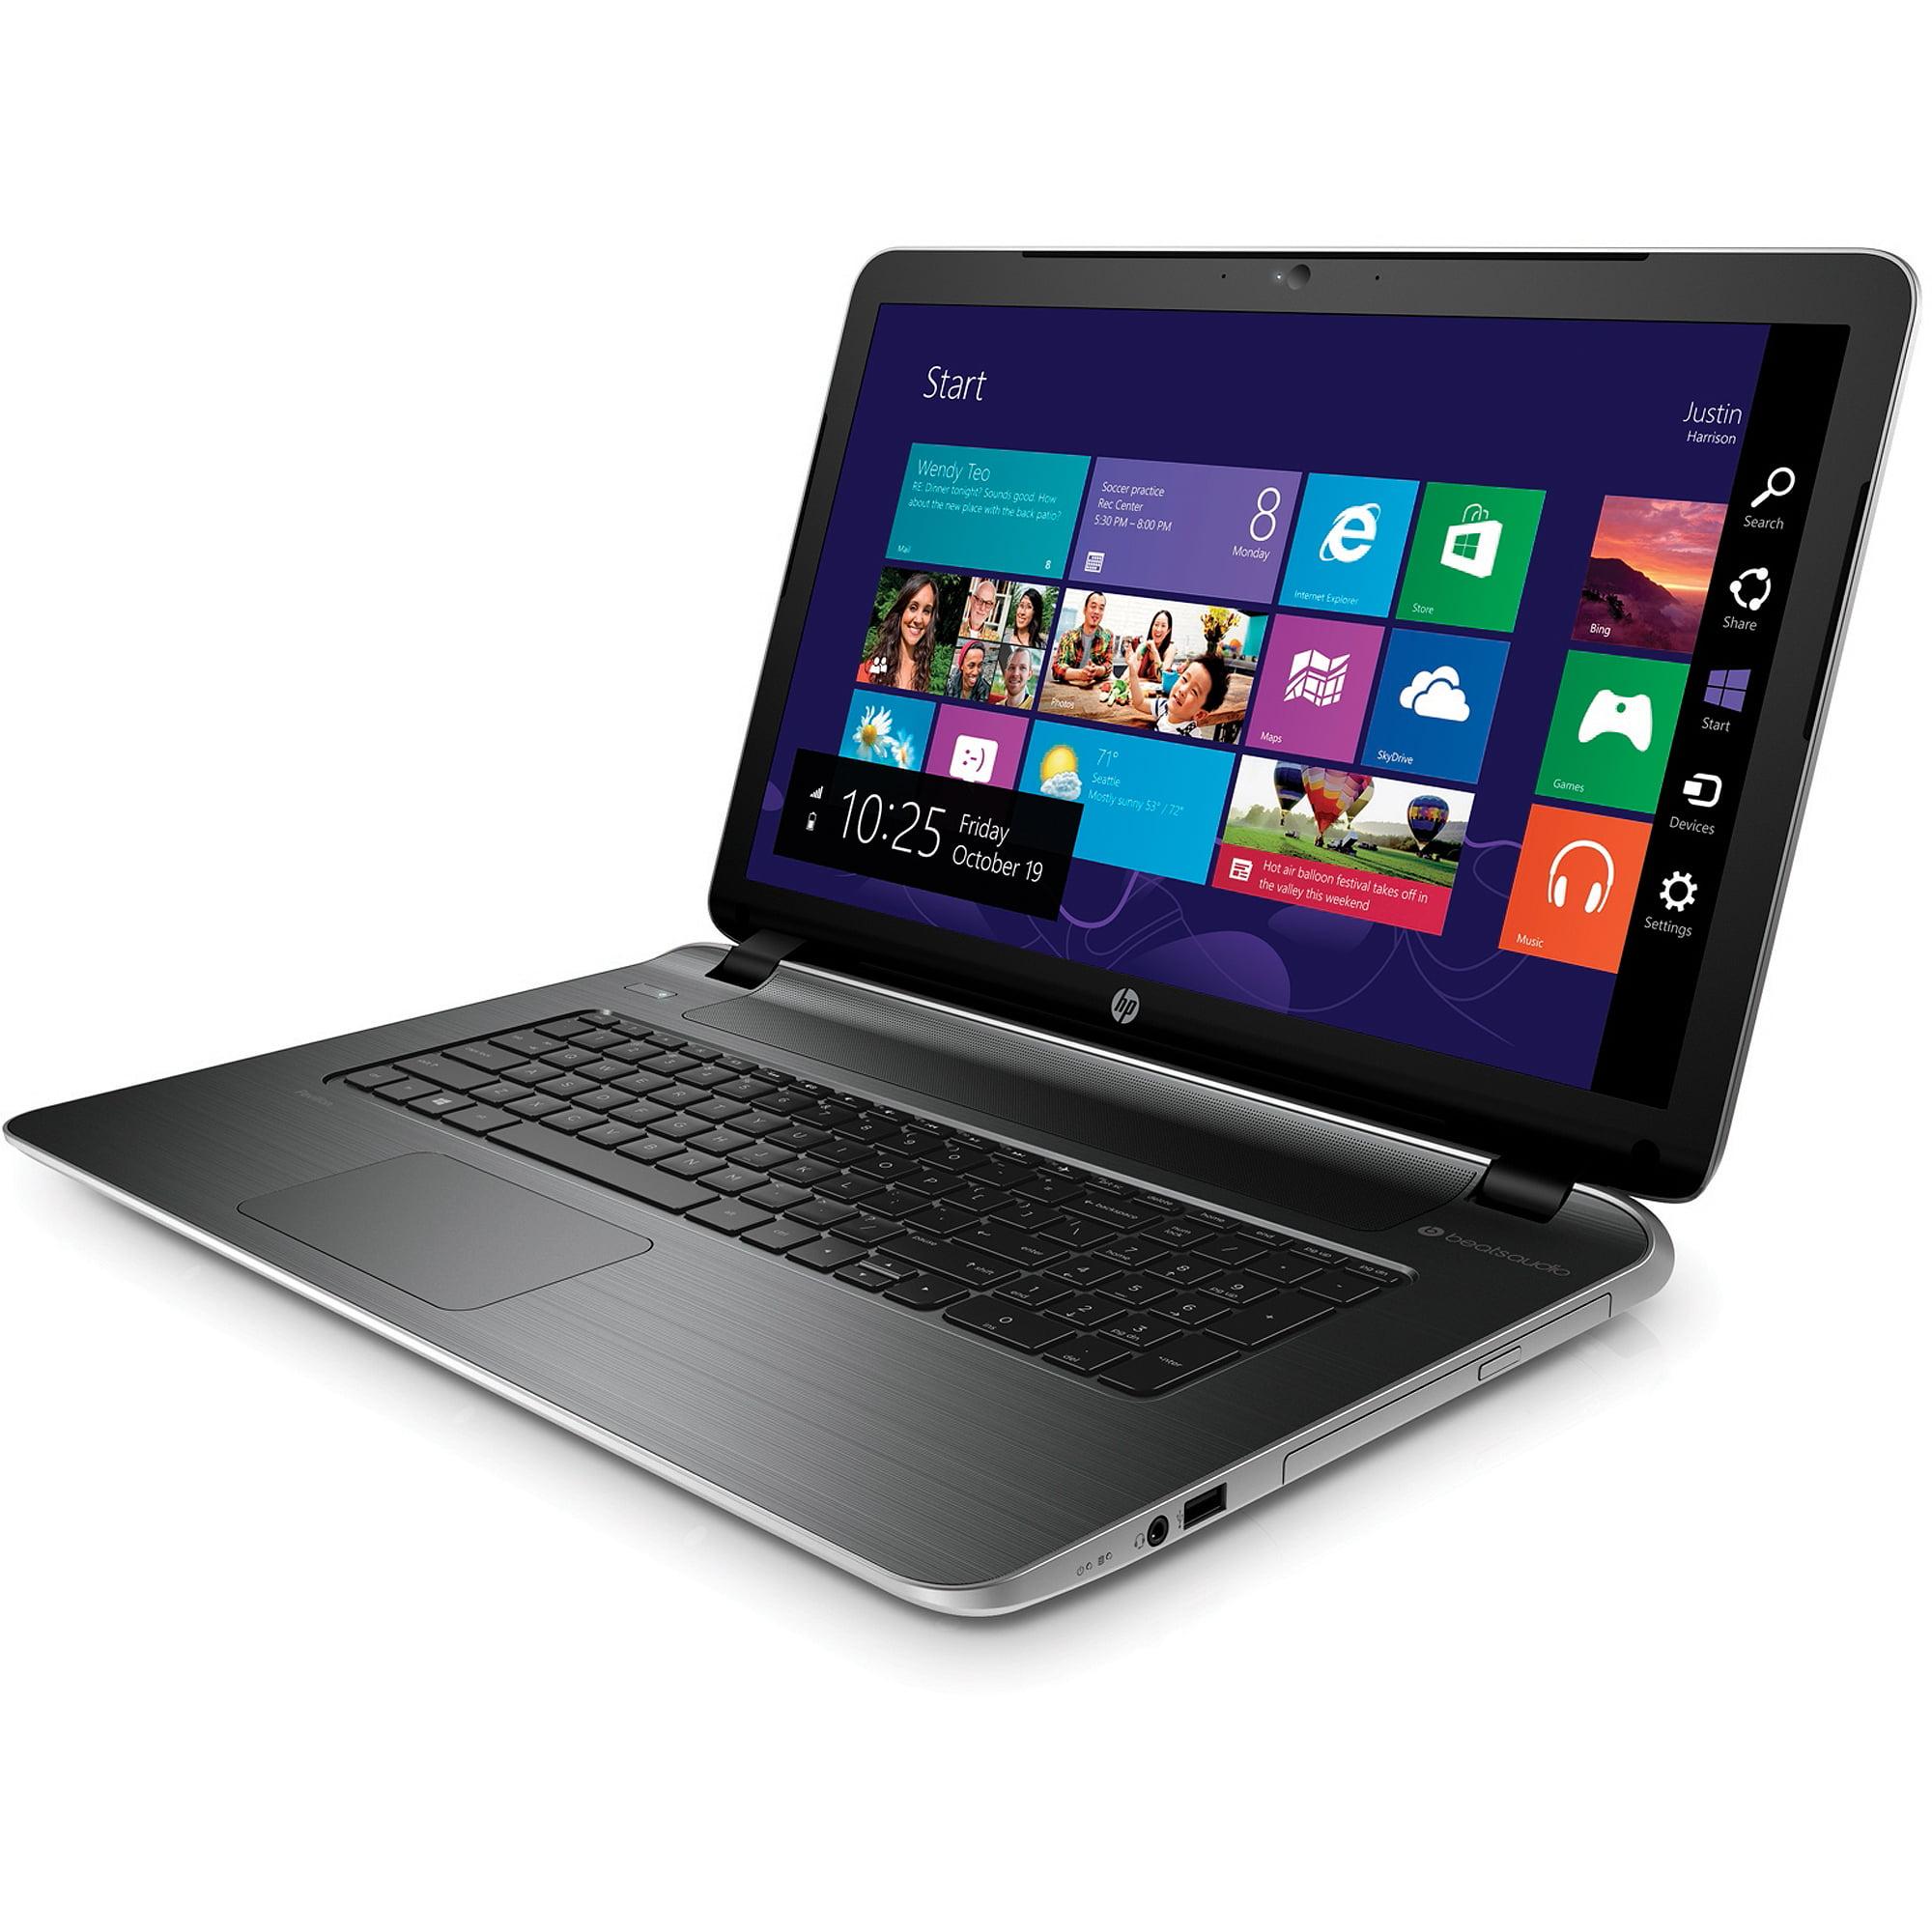 Hp notebook images -  Fast Track Hp 17 F029wm 17 Laptop Walmart Com